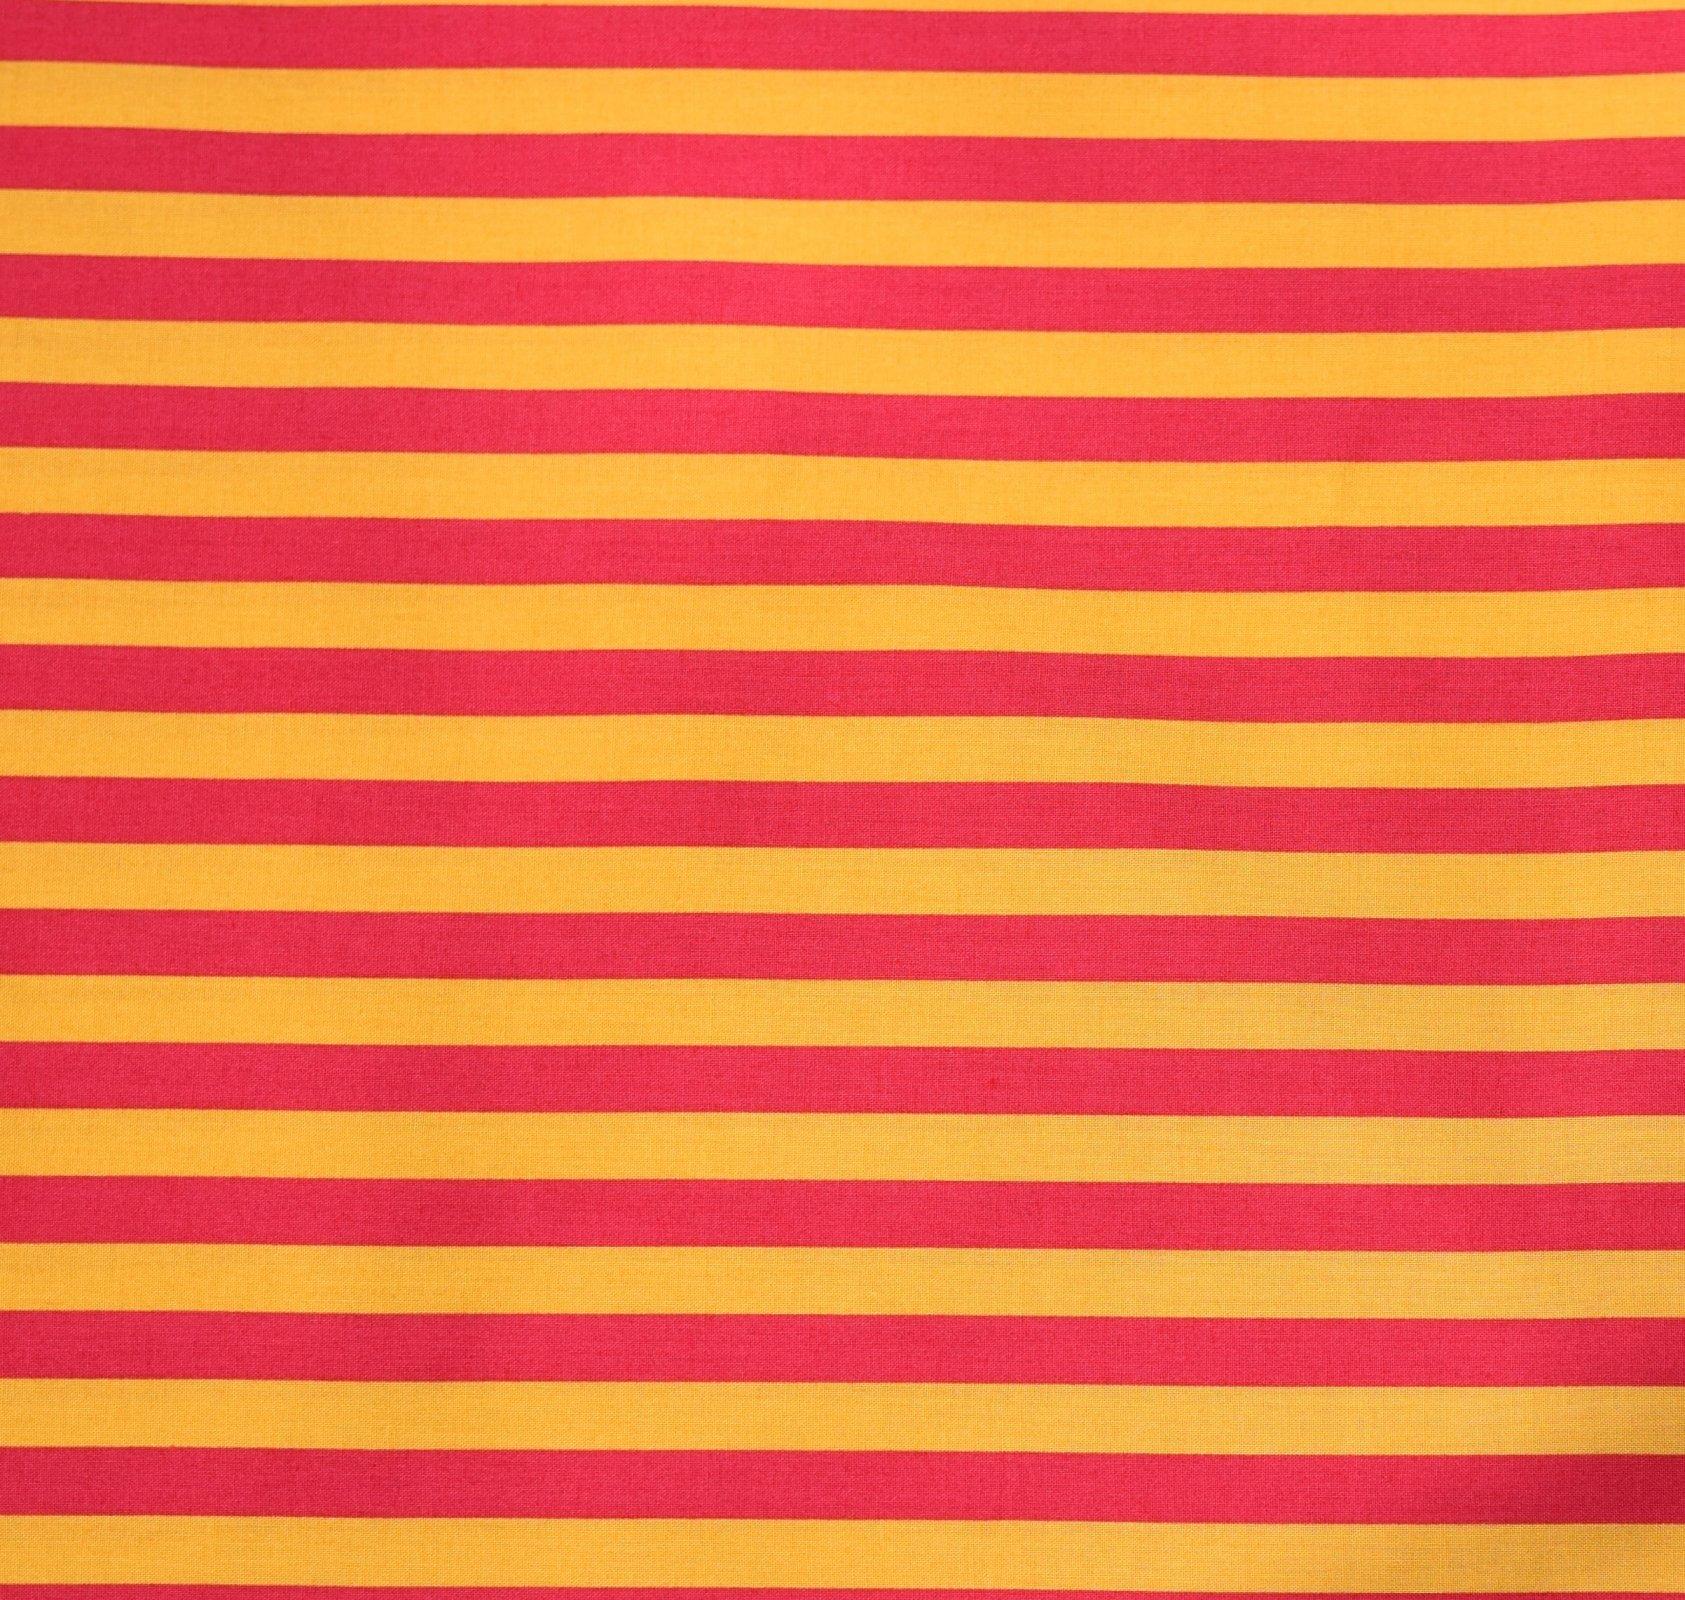 Japanese Fabric - Color Cocktails - Thick Stripe - Orange/Lipstick